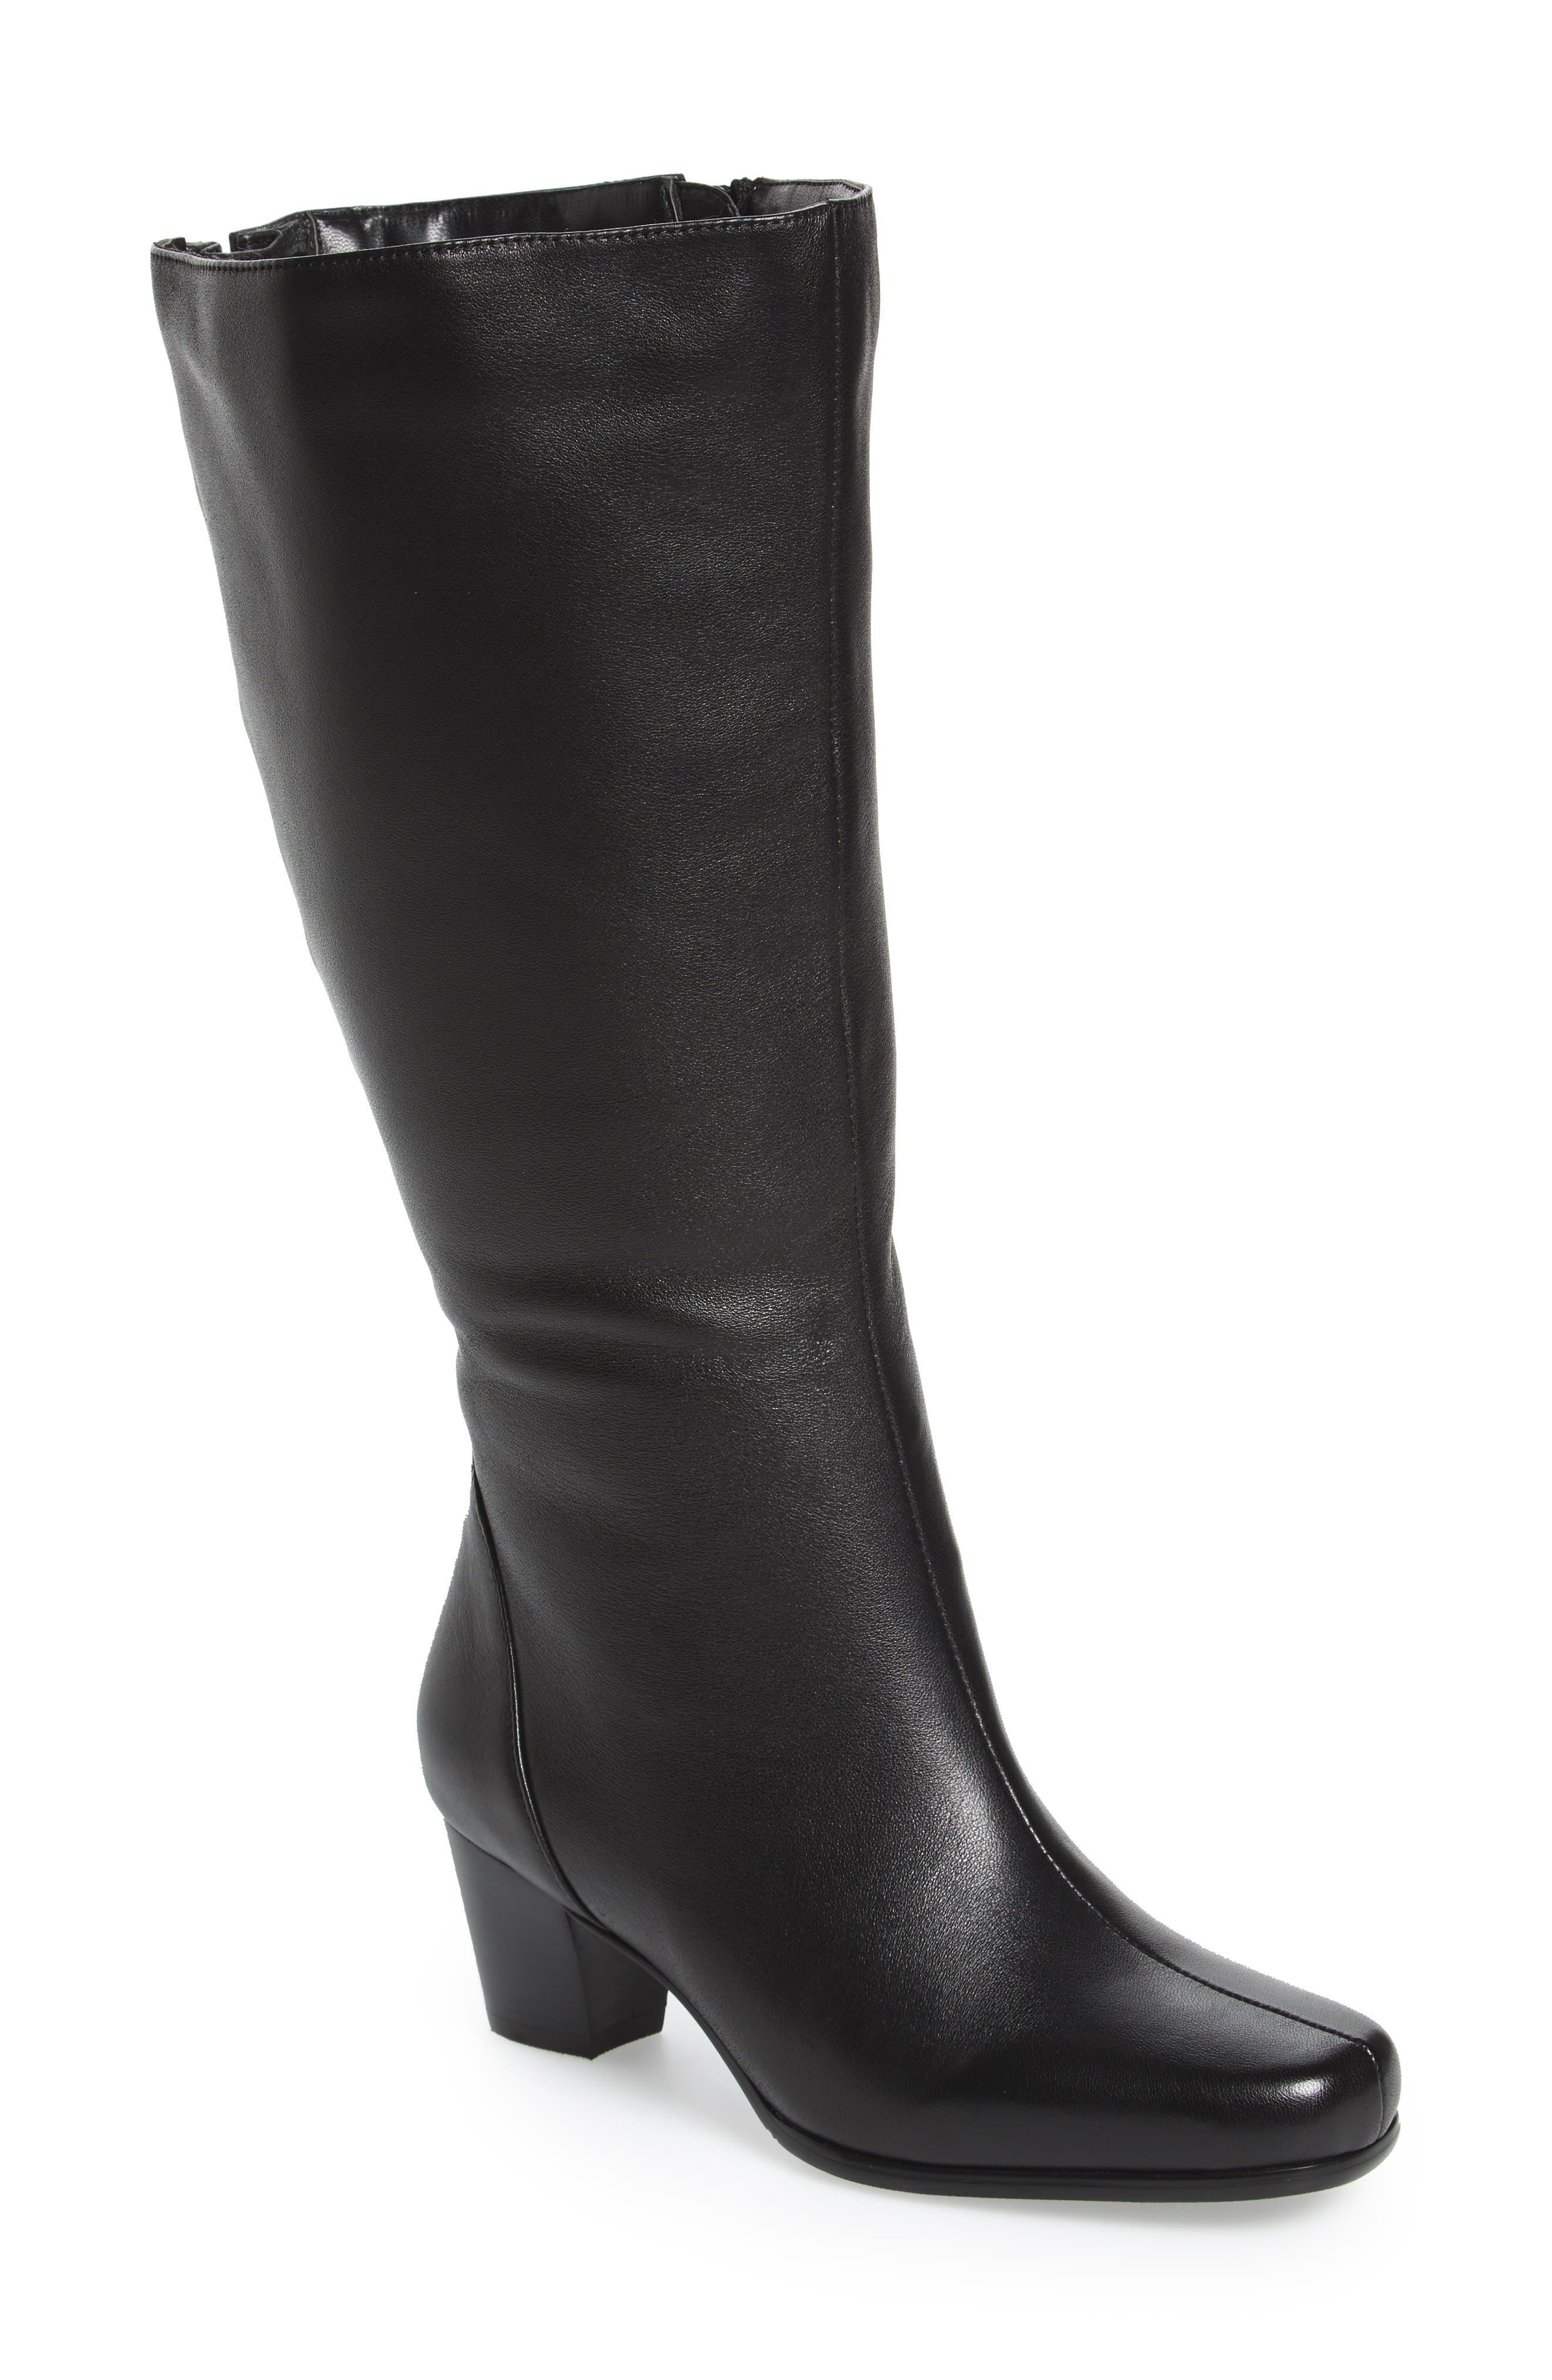 Tacoma 18 Tall Boot,                         Main,                         color, Black Leather